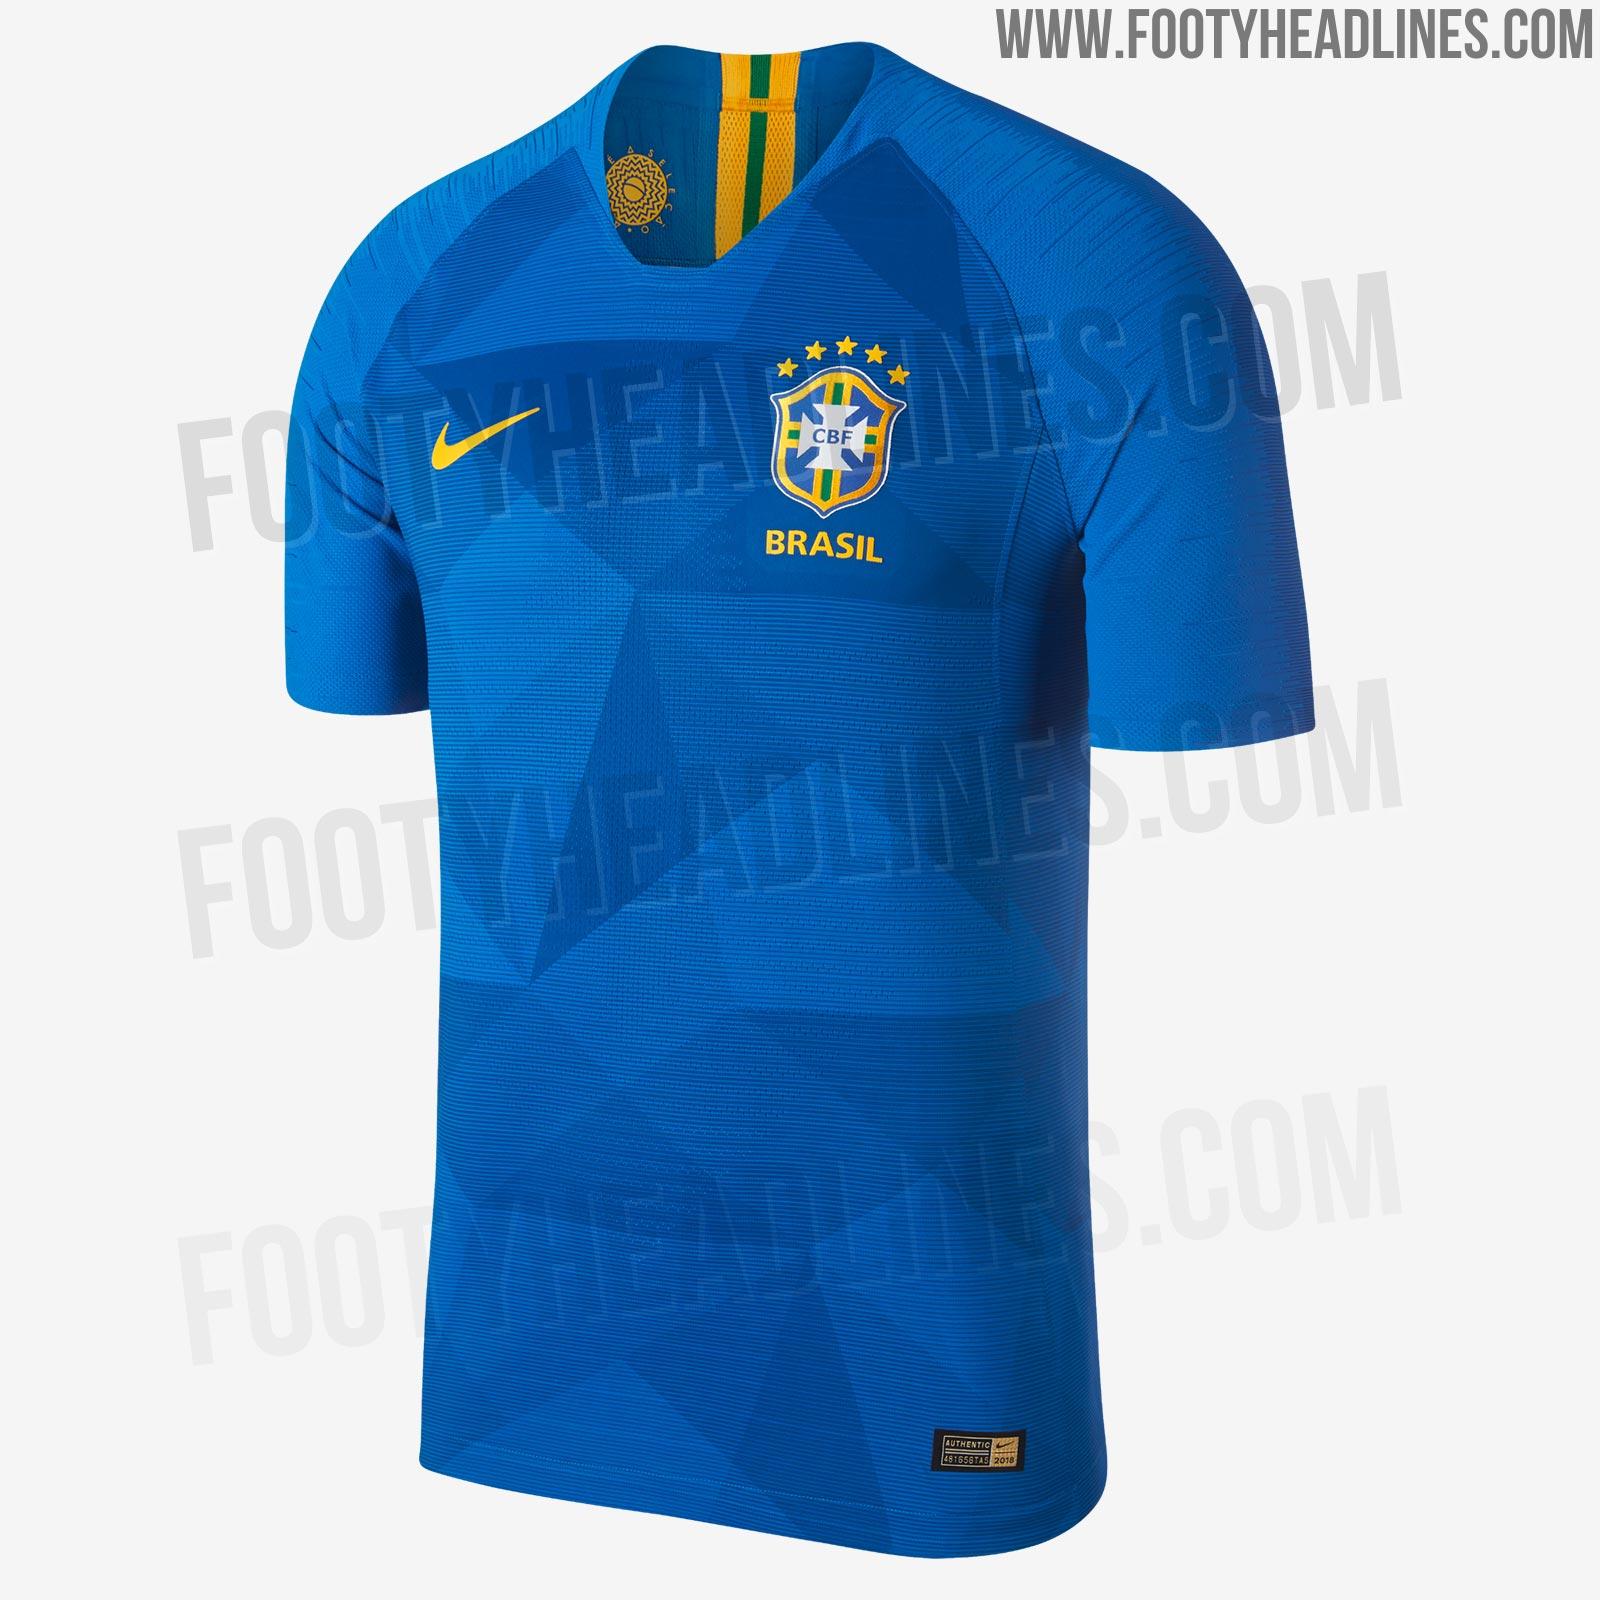 eeb864eccb4 Nike Brazil 2018 World Cup Home   Away Kits Released